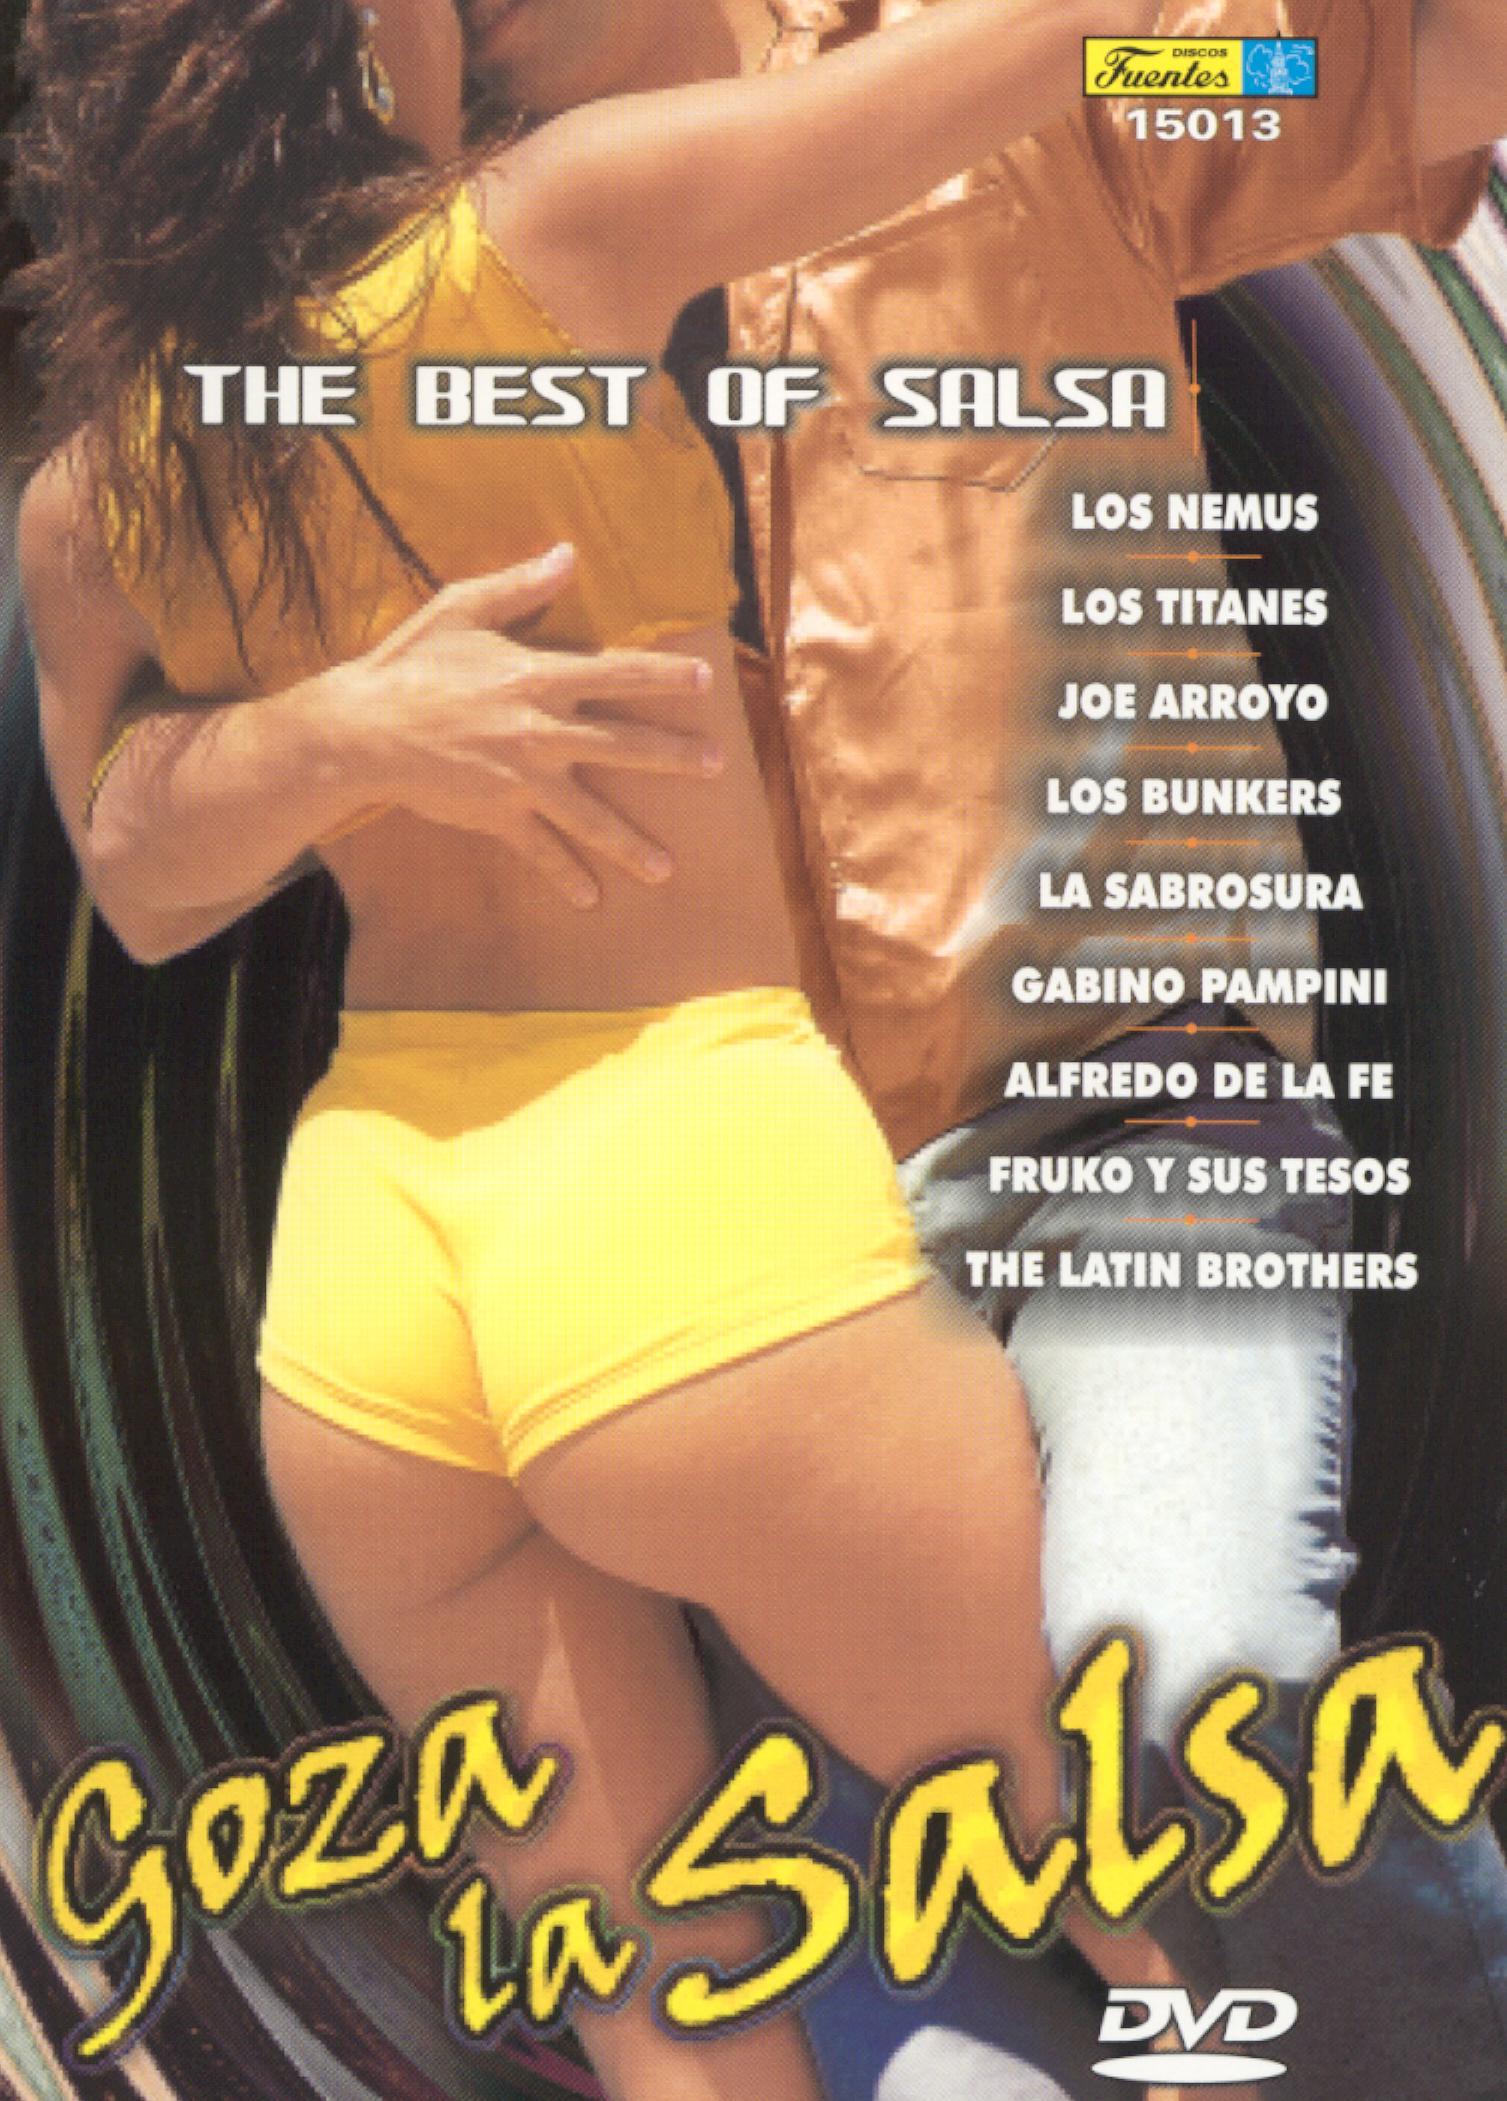 Goza la Salsa: The Best of Salsa